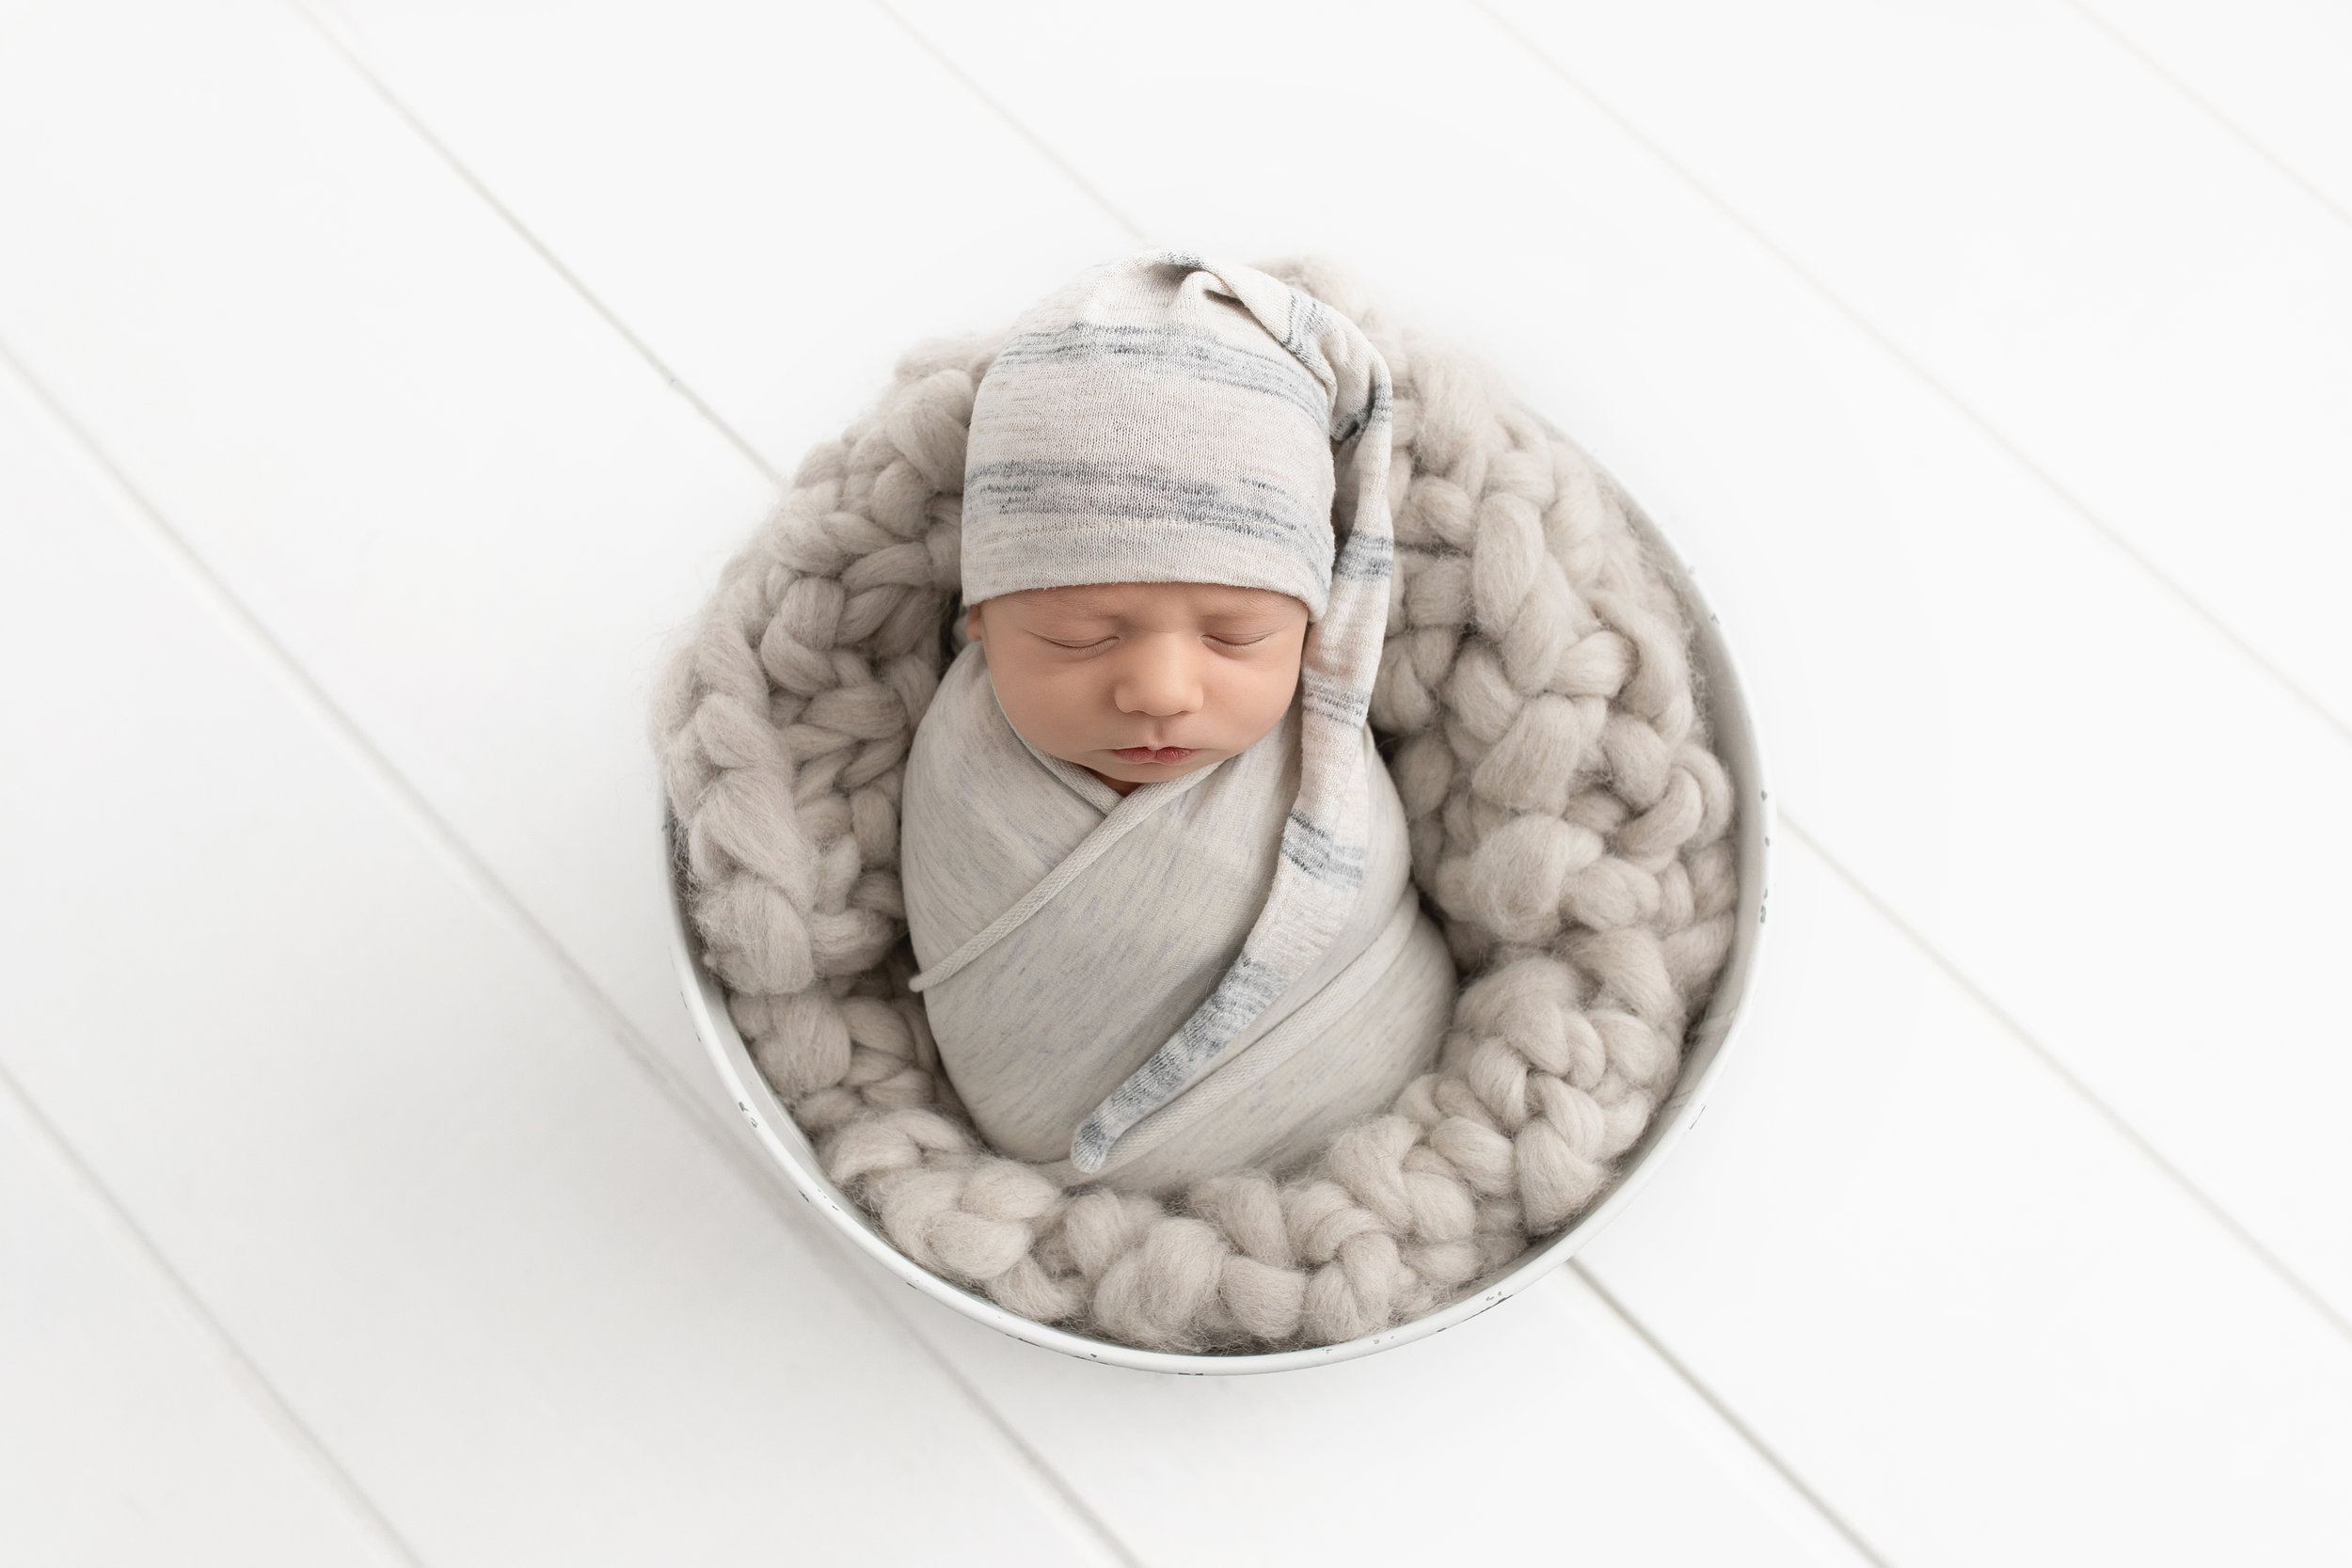 baby photo session edmonton best newborn photographer edmonton blooming bliss photoshoot st-albert